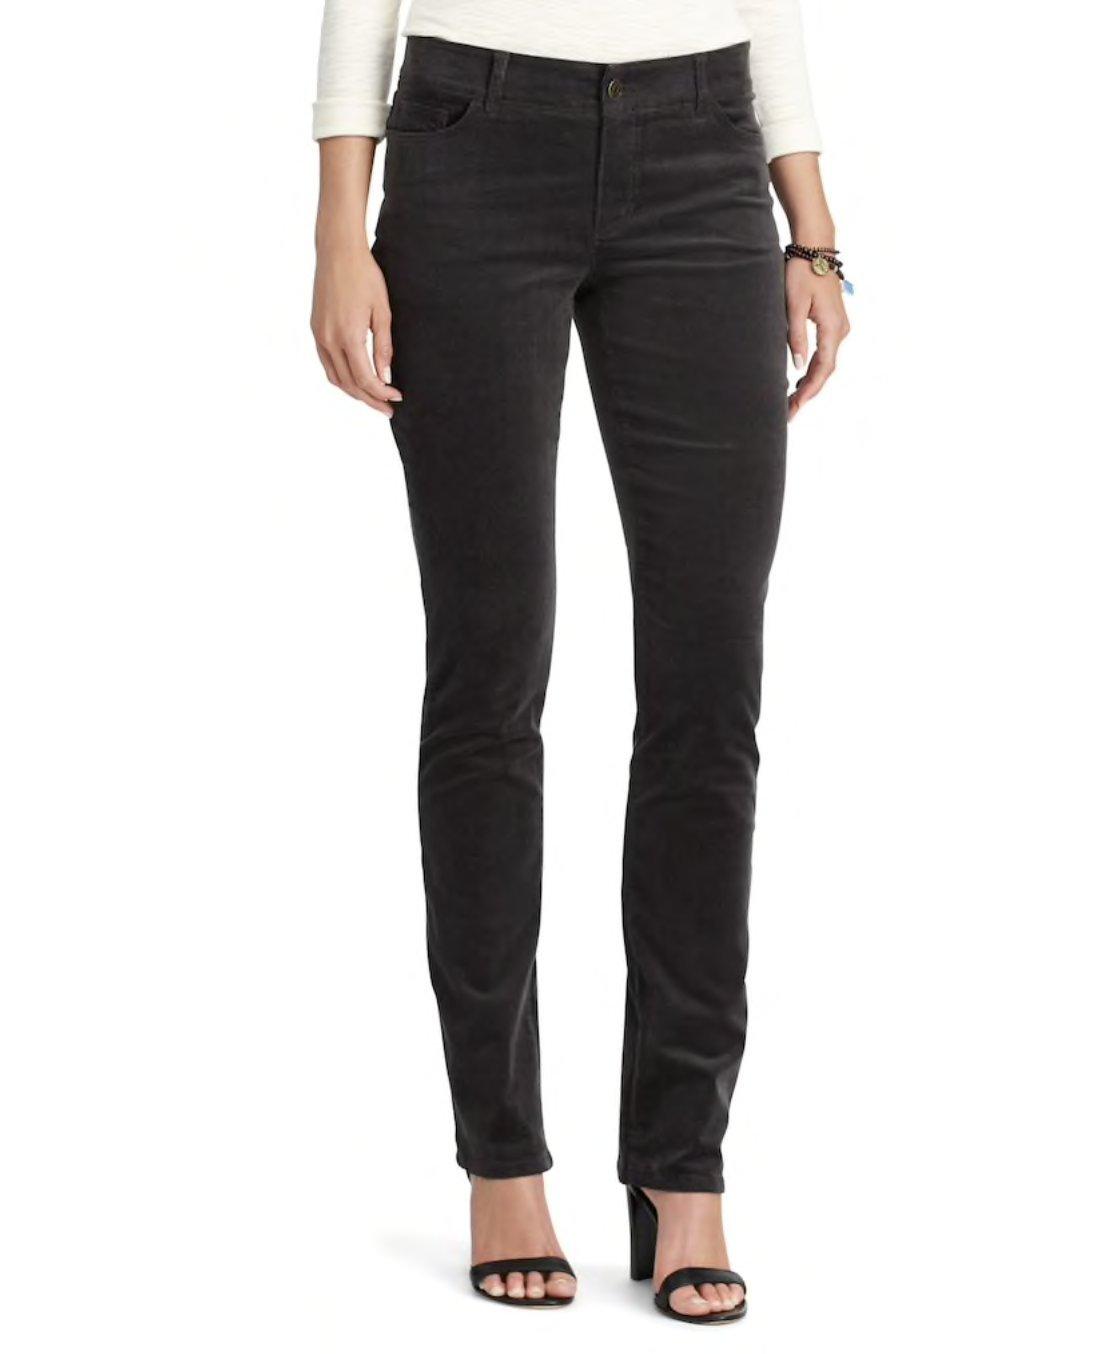 Chaps Petite 4-Way Stretch Straight-Leg Corduroy Pants (Grey, 6 Petite)